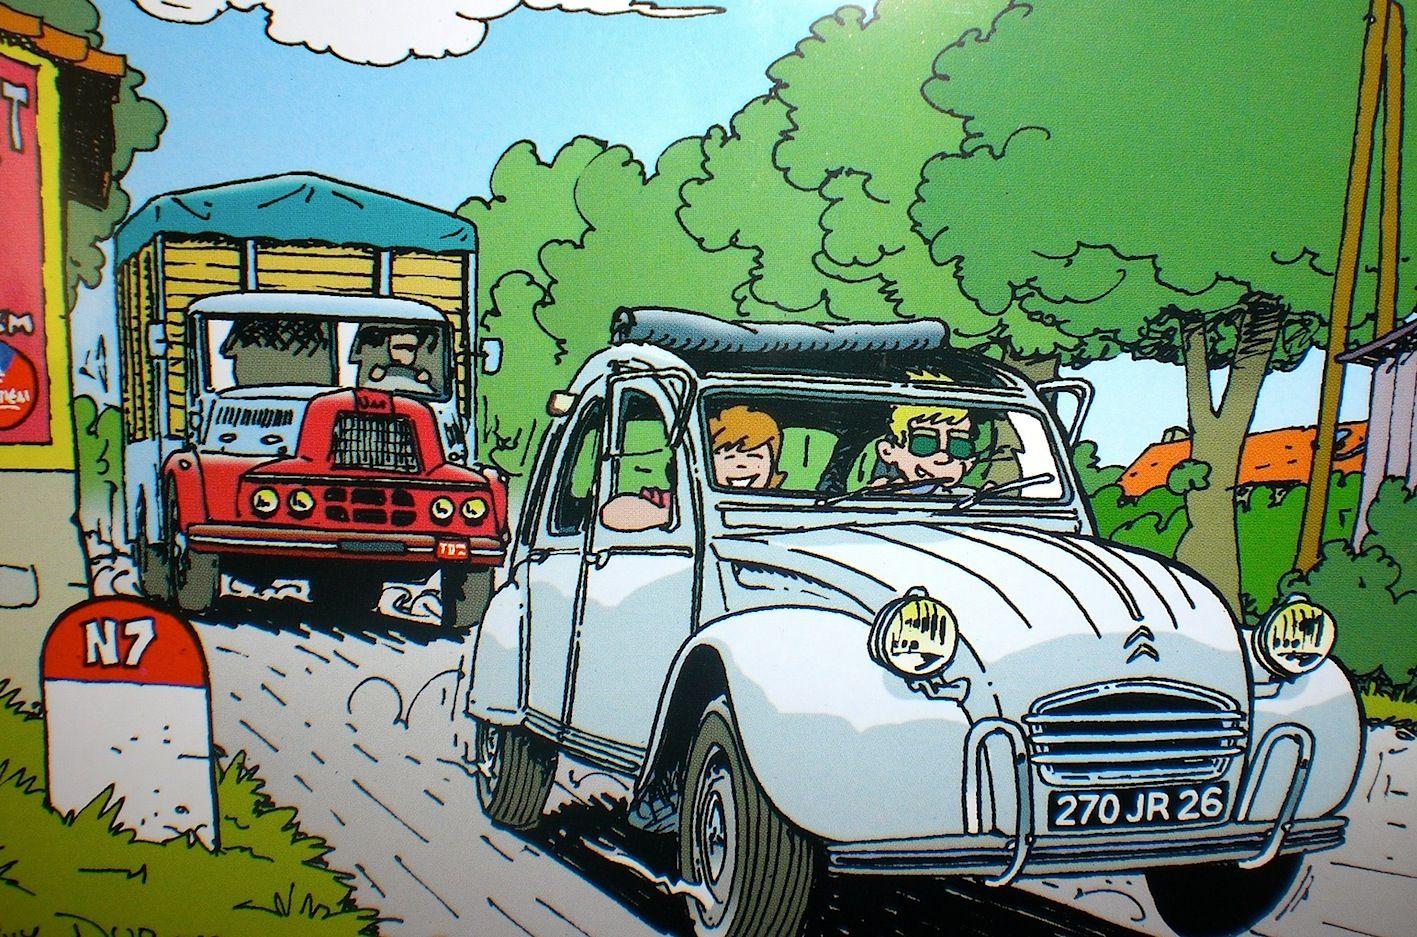 Citro n 2cv dessins pinterest 2cv voitures et bd - Dessin 2cv humour ...